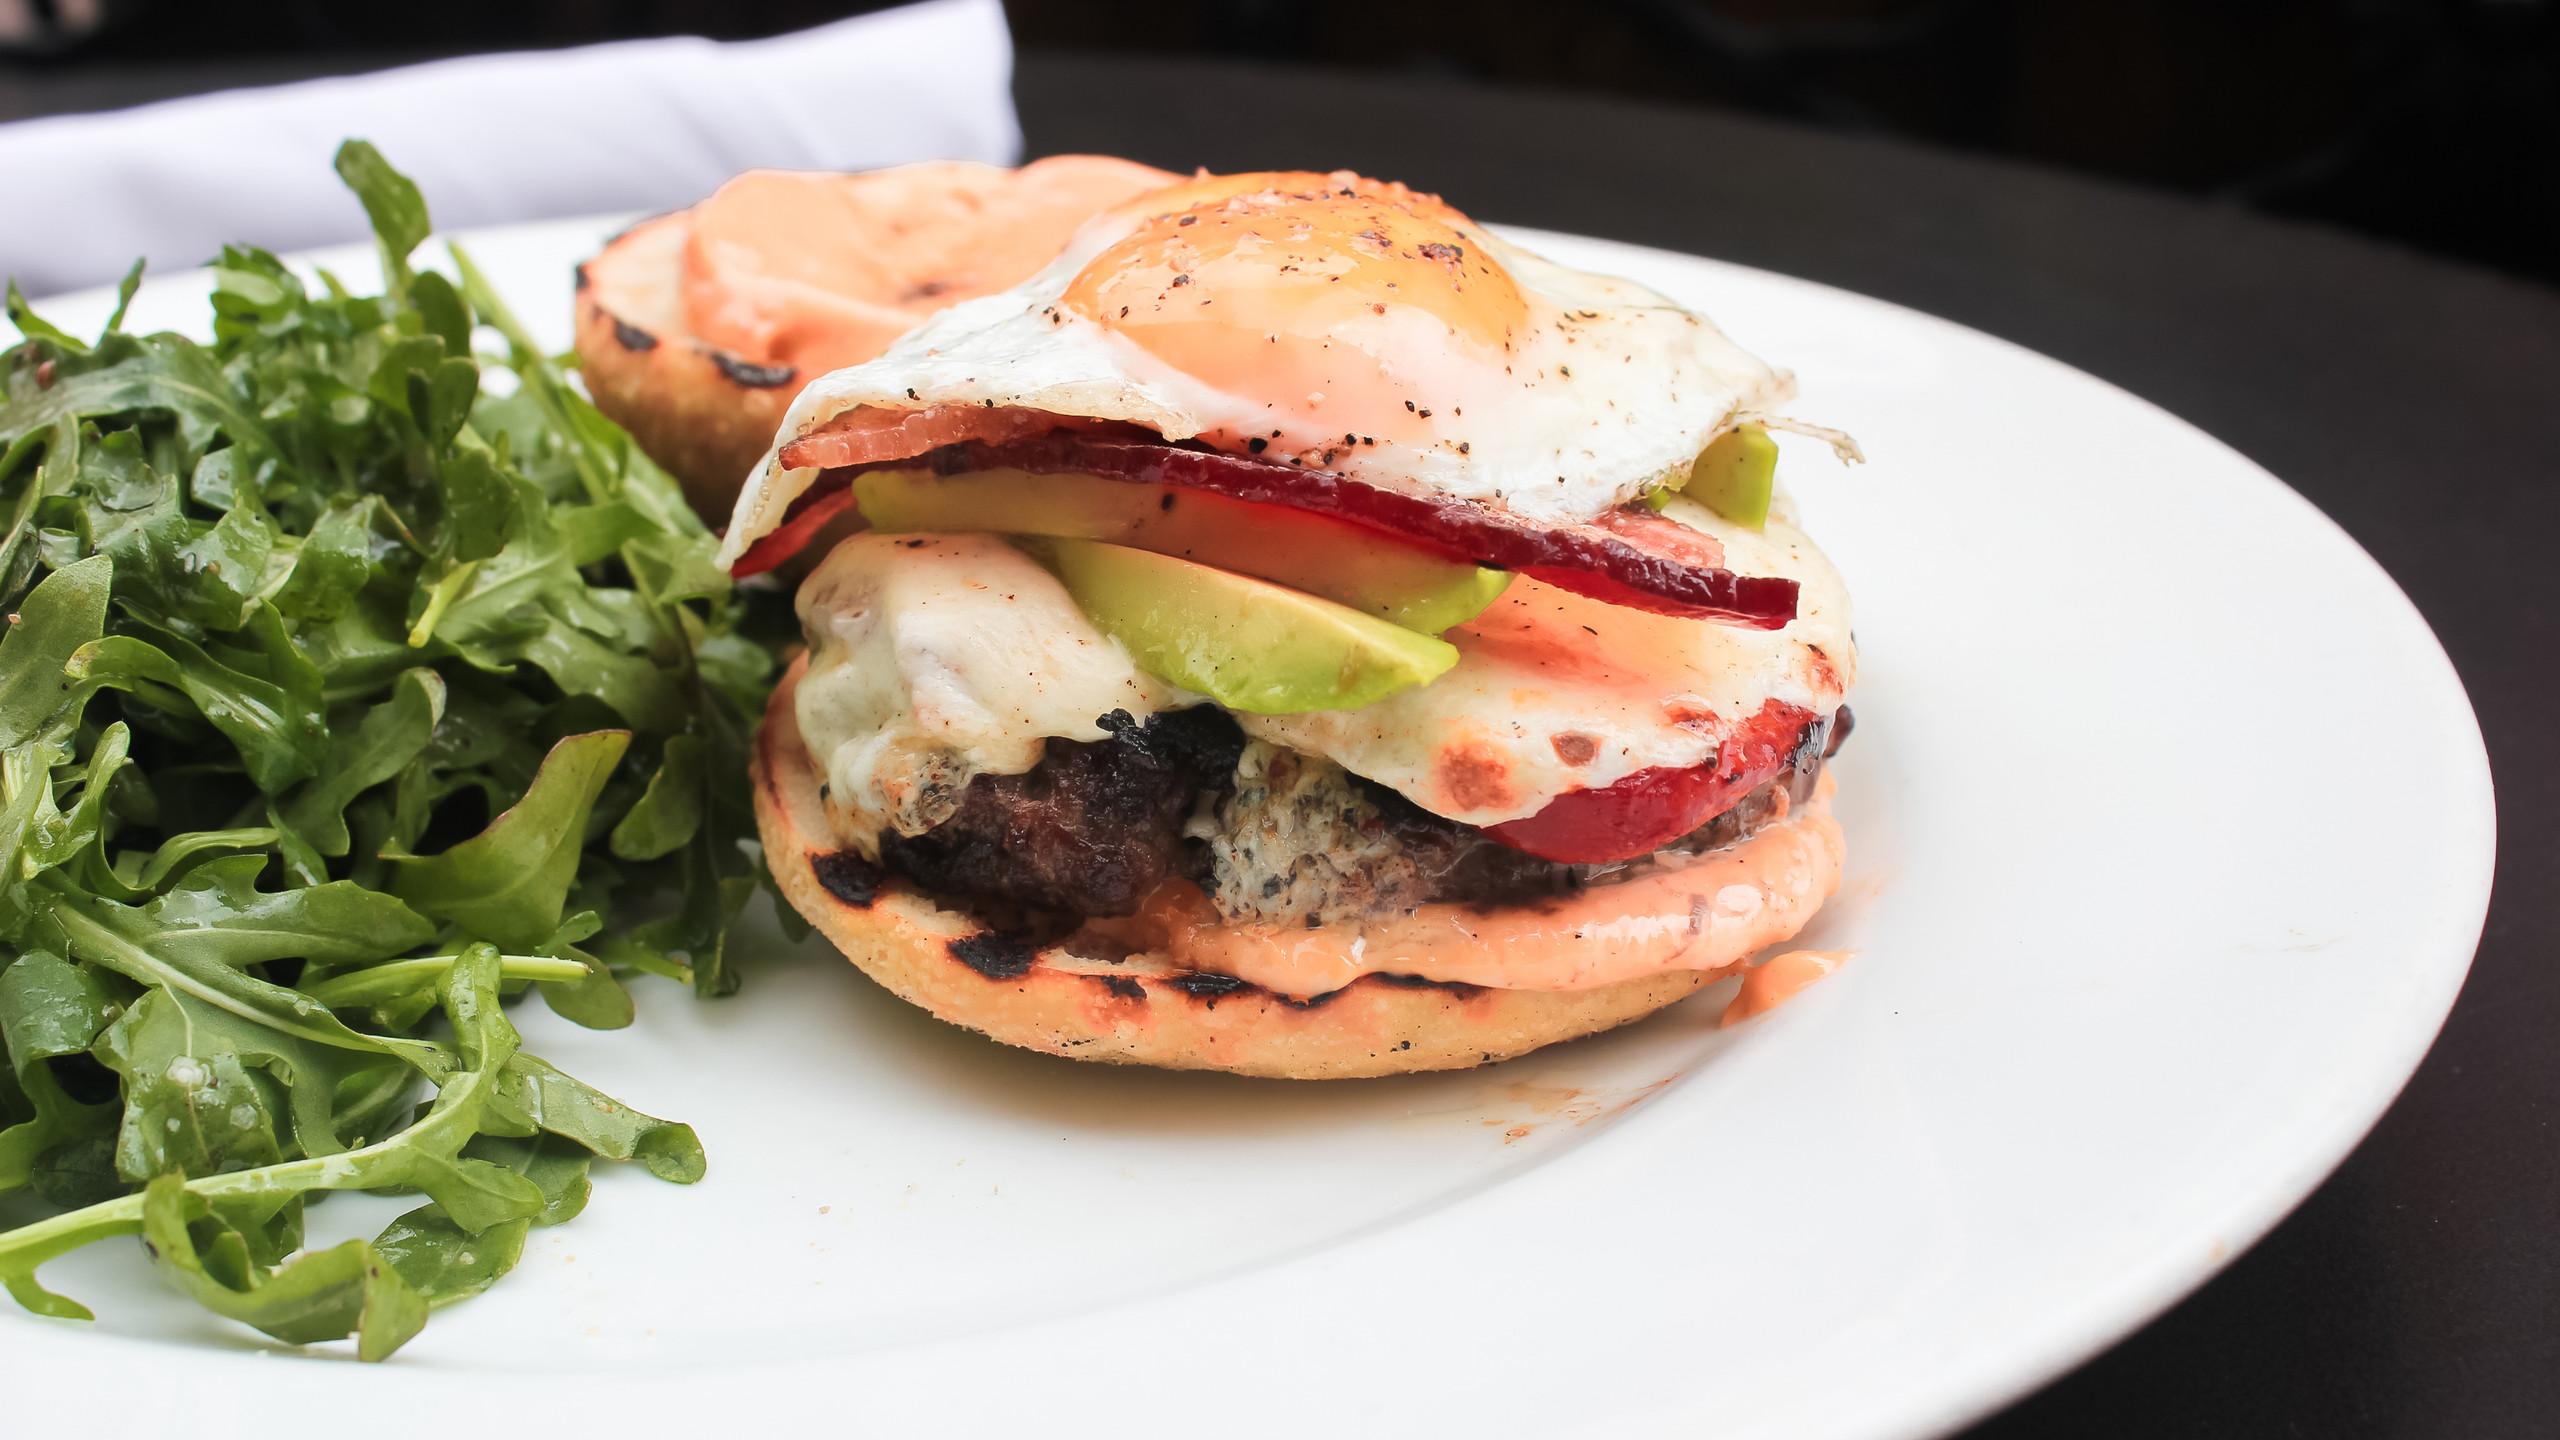 Colorado Lamb Burger from Rioja Den